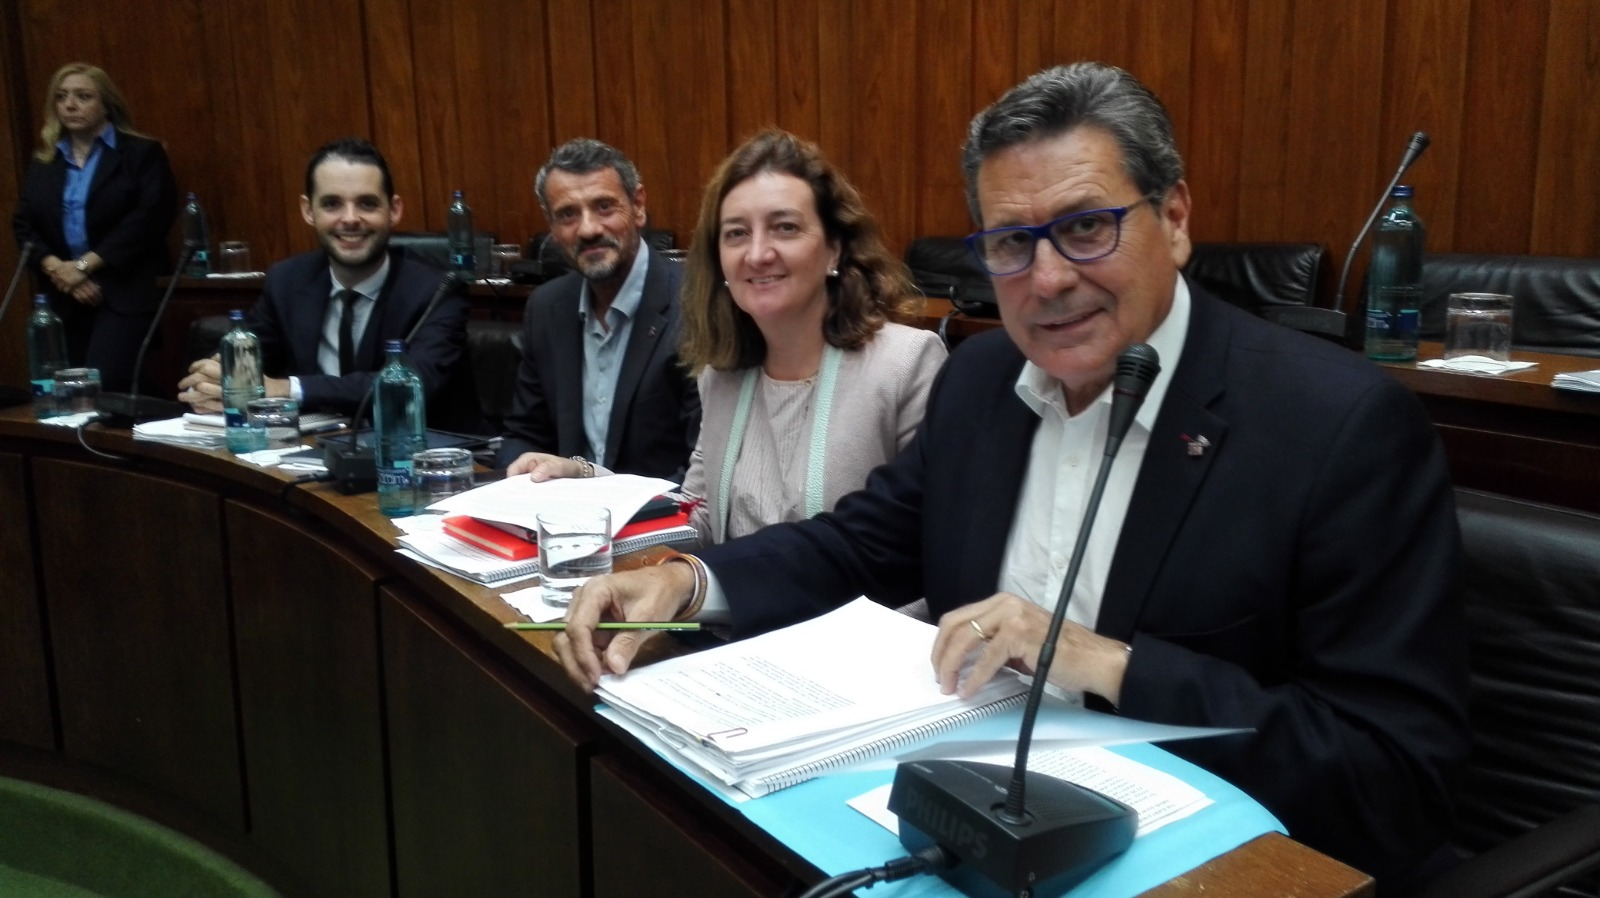 Los cuatro concejales de Cs l'Hospitalet momentos antes de arrancar el pleno de septiembre